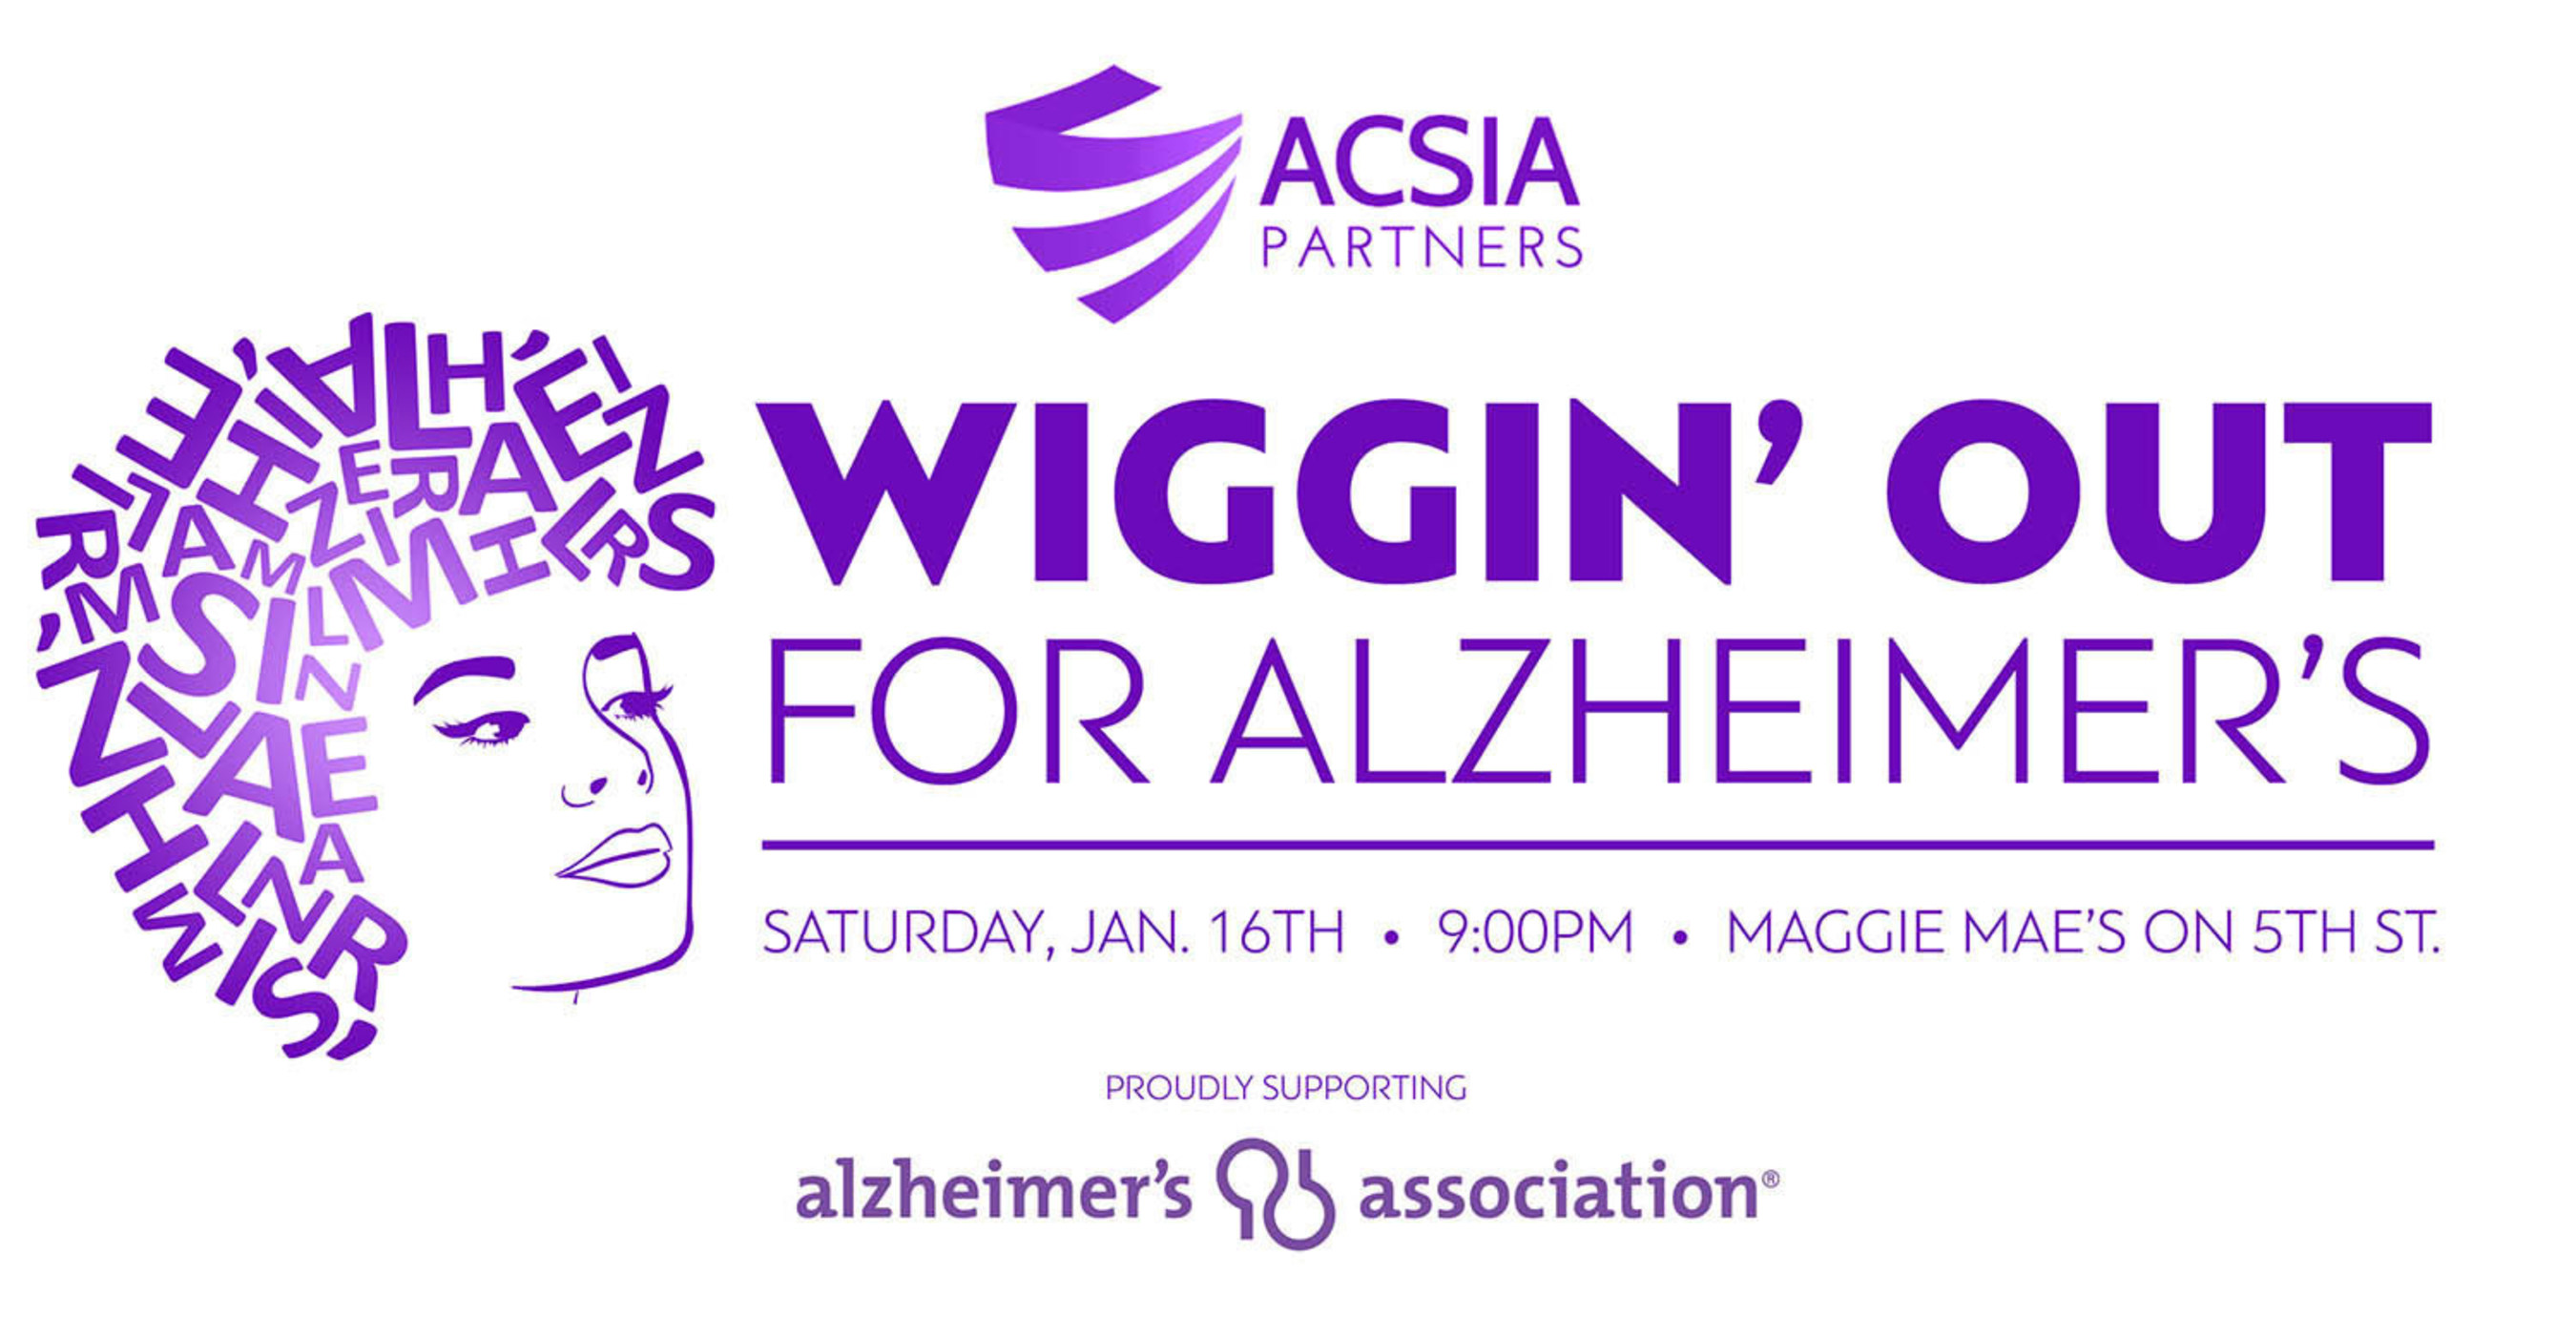 Long-Term Care Insurance Leader ACSIA Partners Targets Alzheimer's, an Illness That Affects